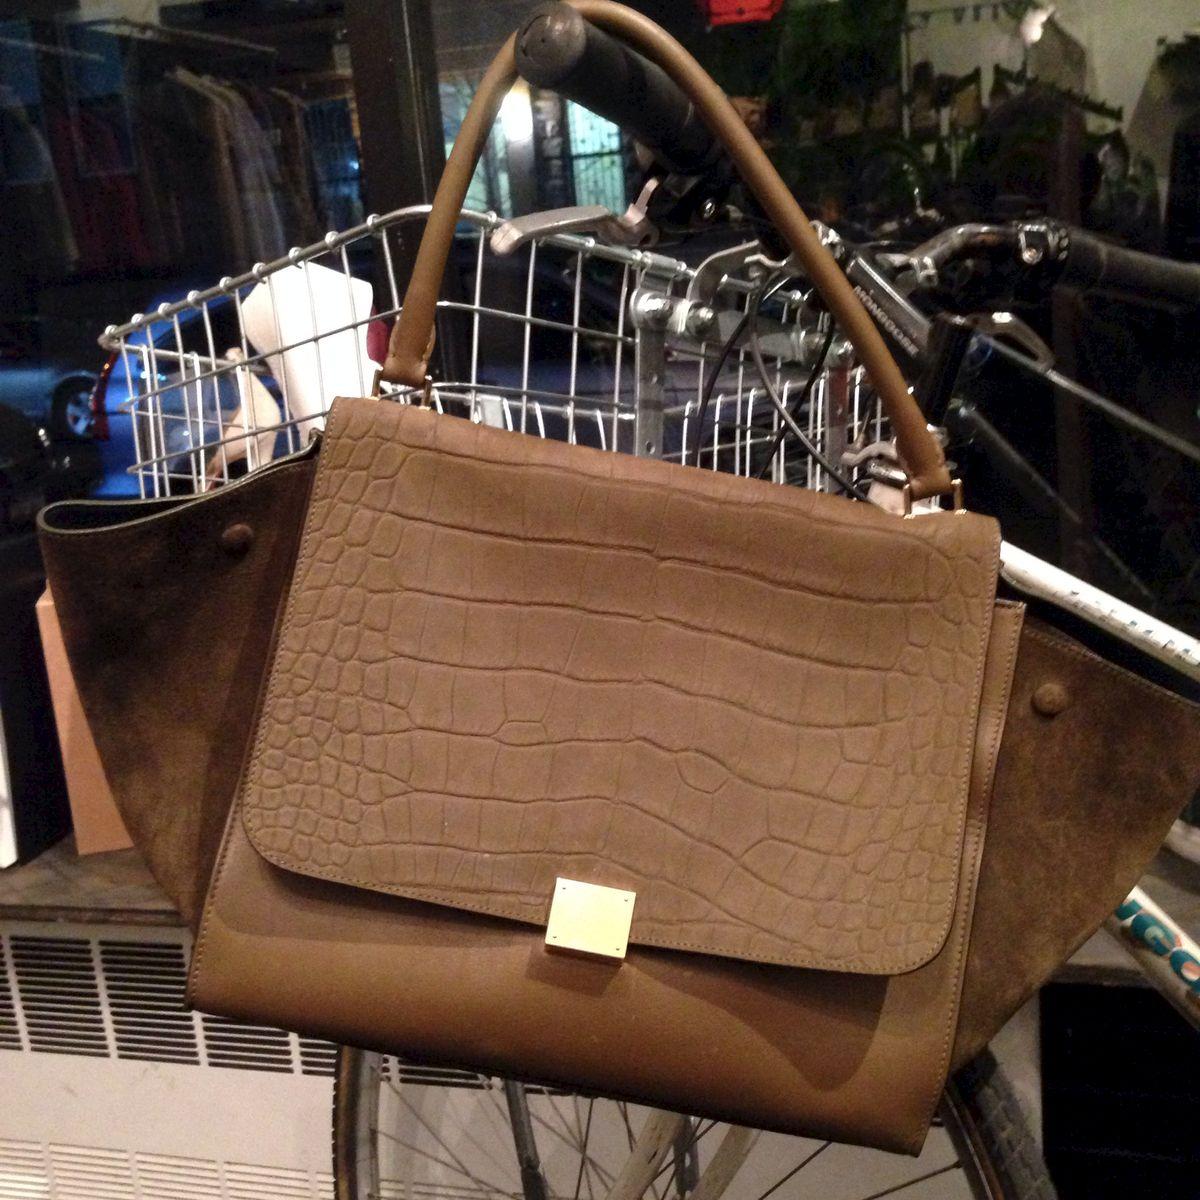 best celine bag - SOLD-Celine Olive Suede Croc Trapeze - Trunk Show Designer Consignment